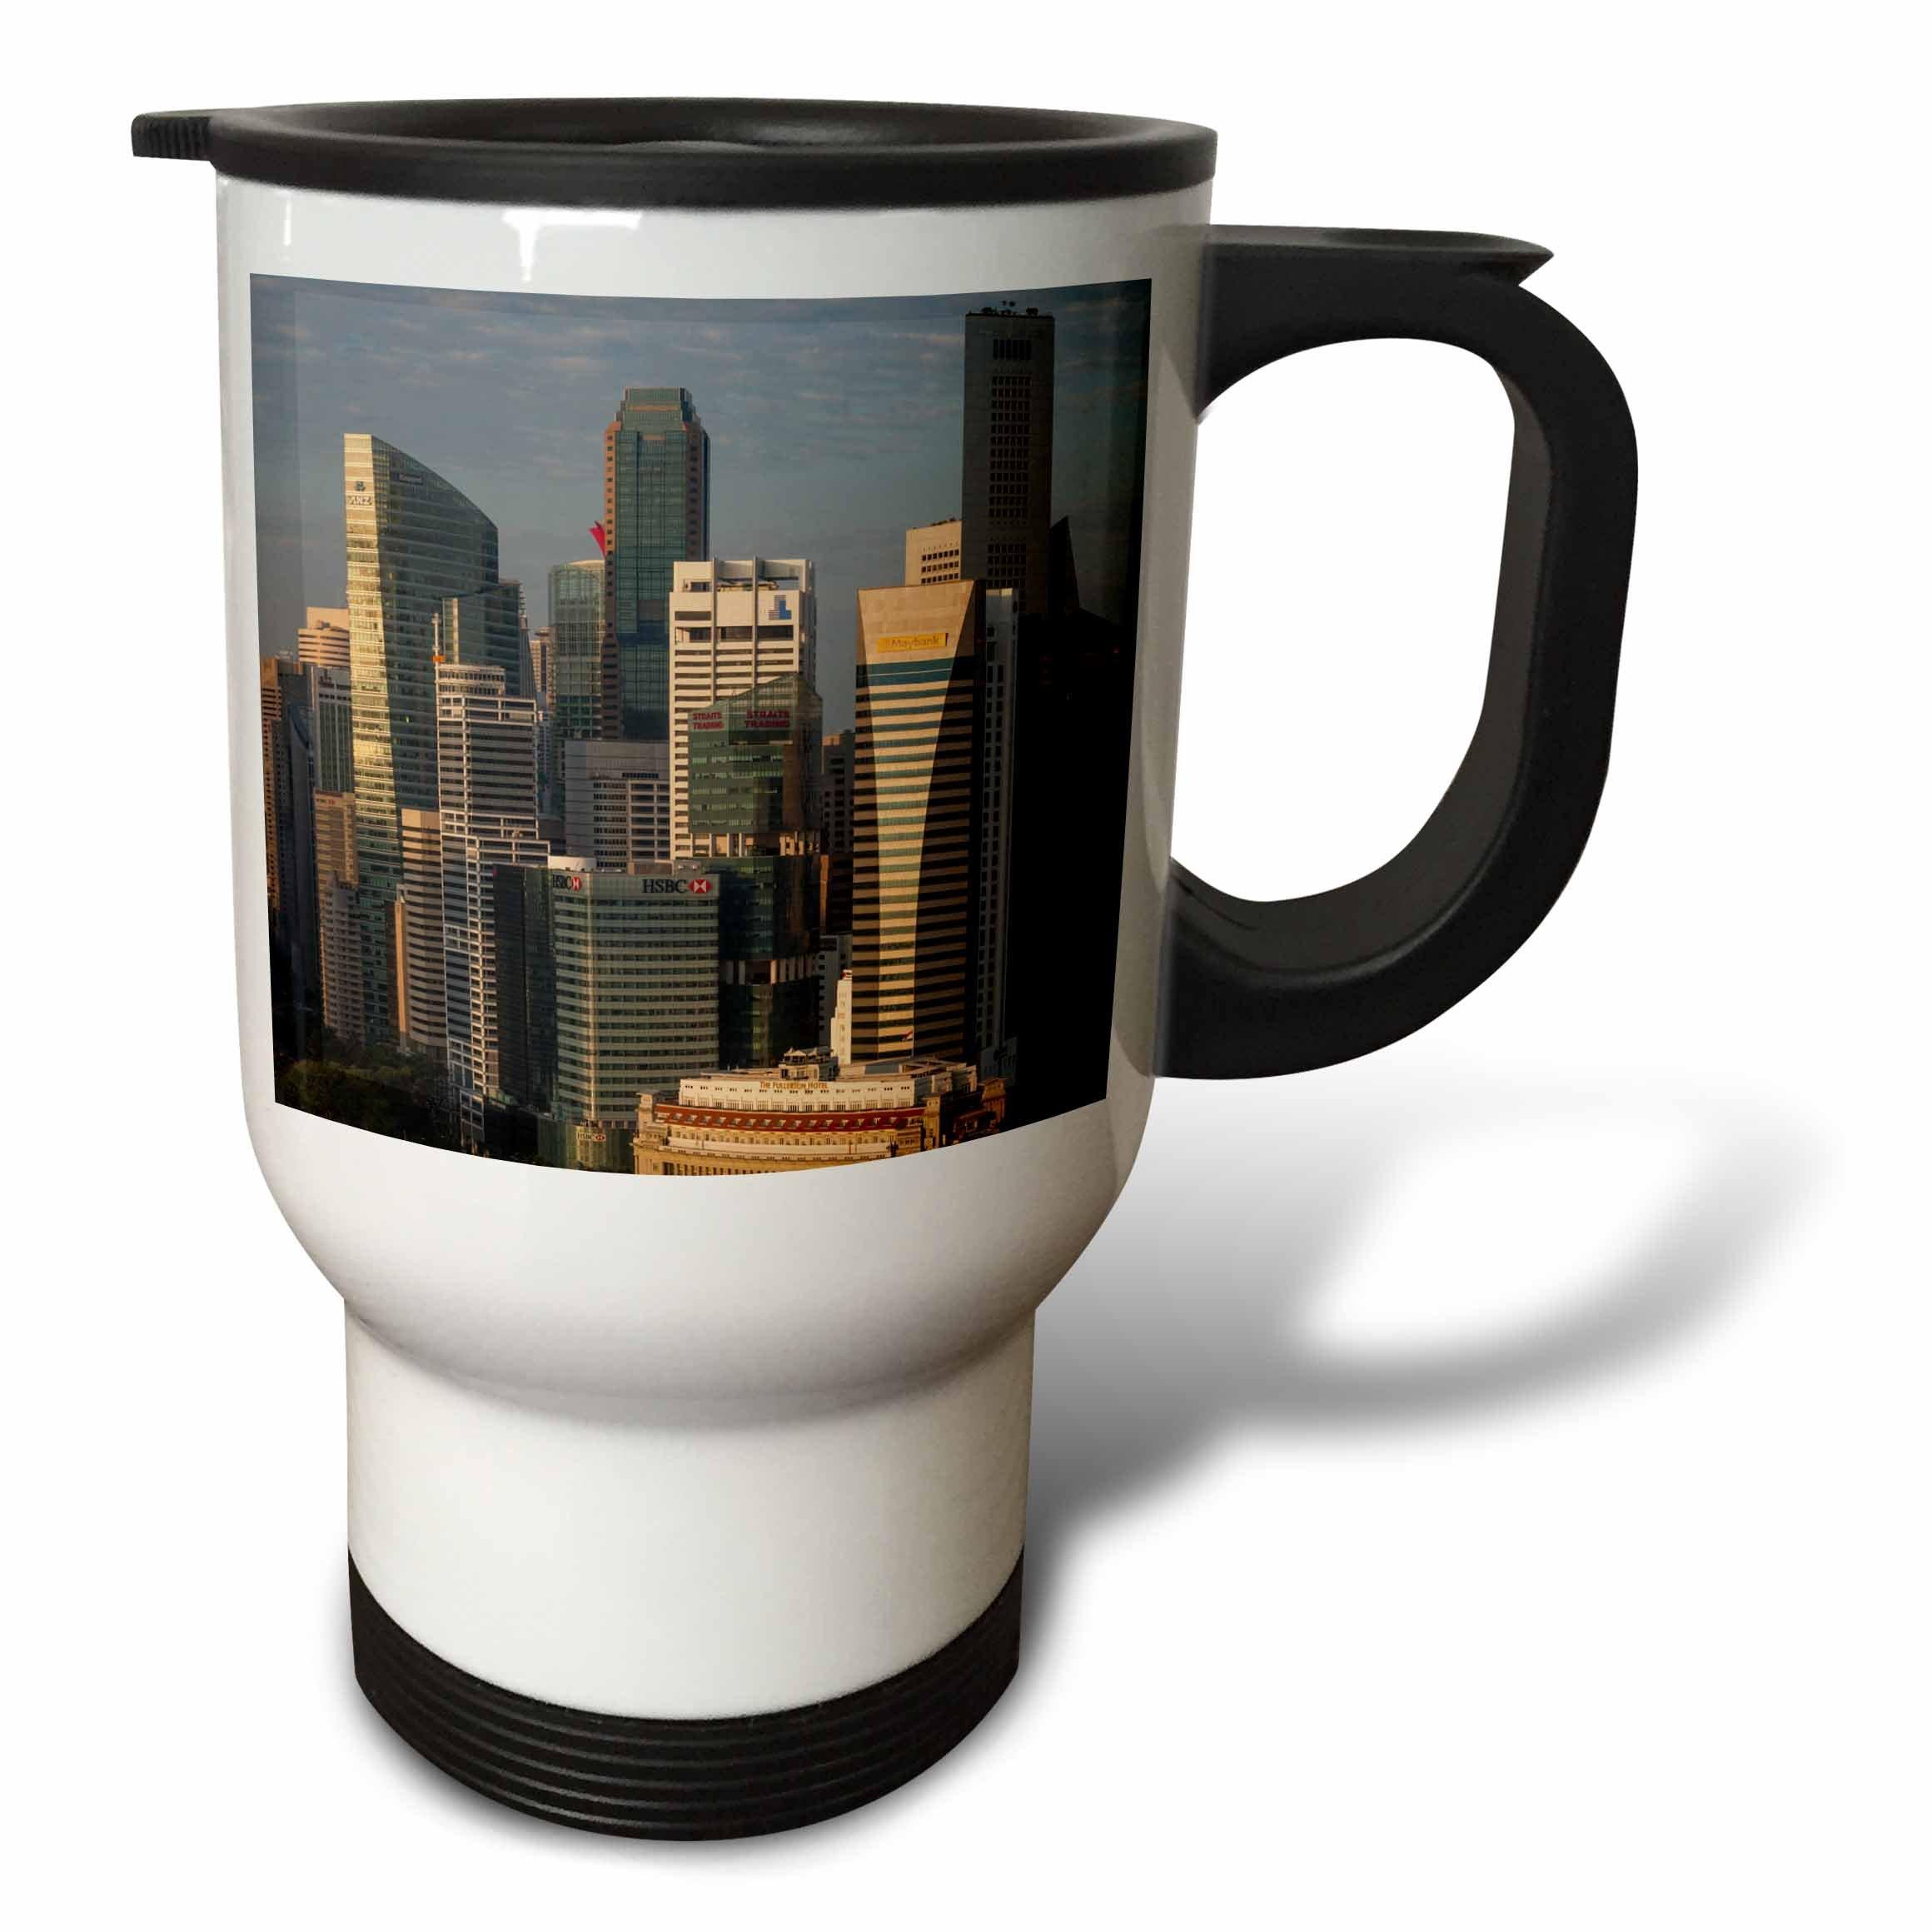 3dRose Danita Delimont - Cities - Singapore, elevated skyline view above Fullerton Hotel, dawn - 14oz Stainless Steel Travel Mug (tm_257279_1)